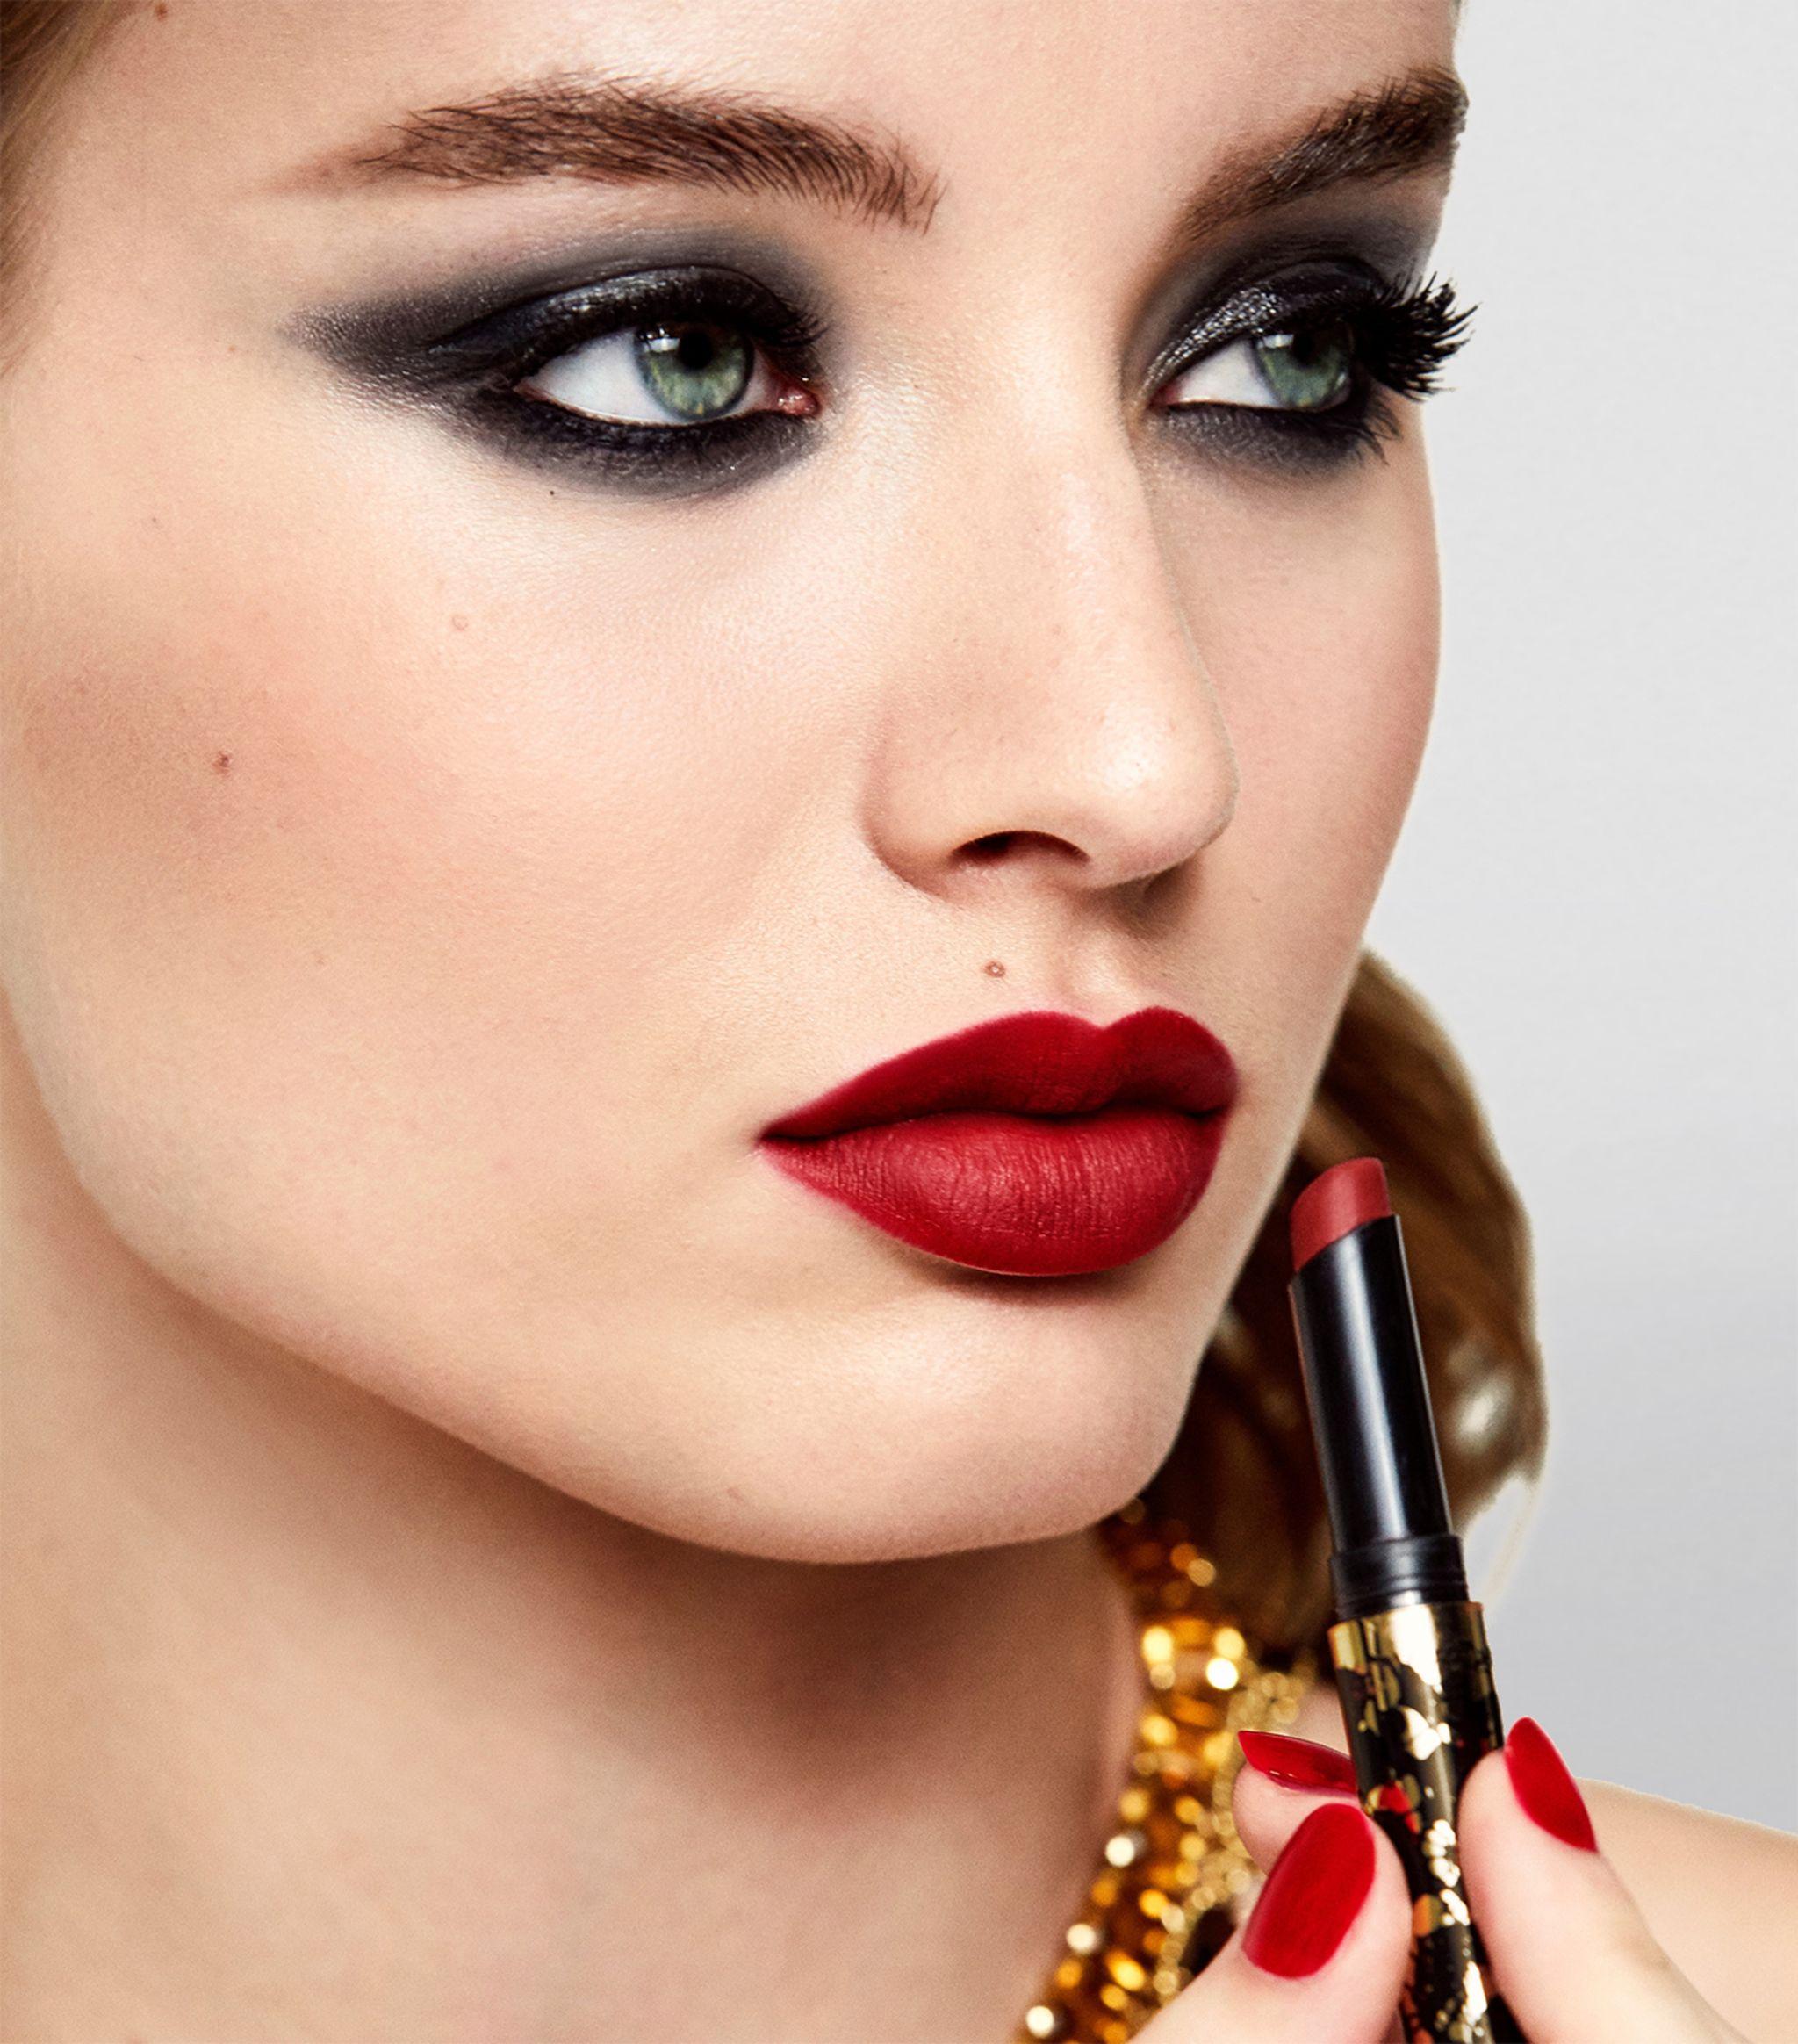 Dolce Gabbana Beauty Passionlips Lipstick Beautyvelle Makeup News Per dolce&gabbana beauty, il rossetto è più di semplice makeup: dolce gabbana beauty passionlips